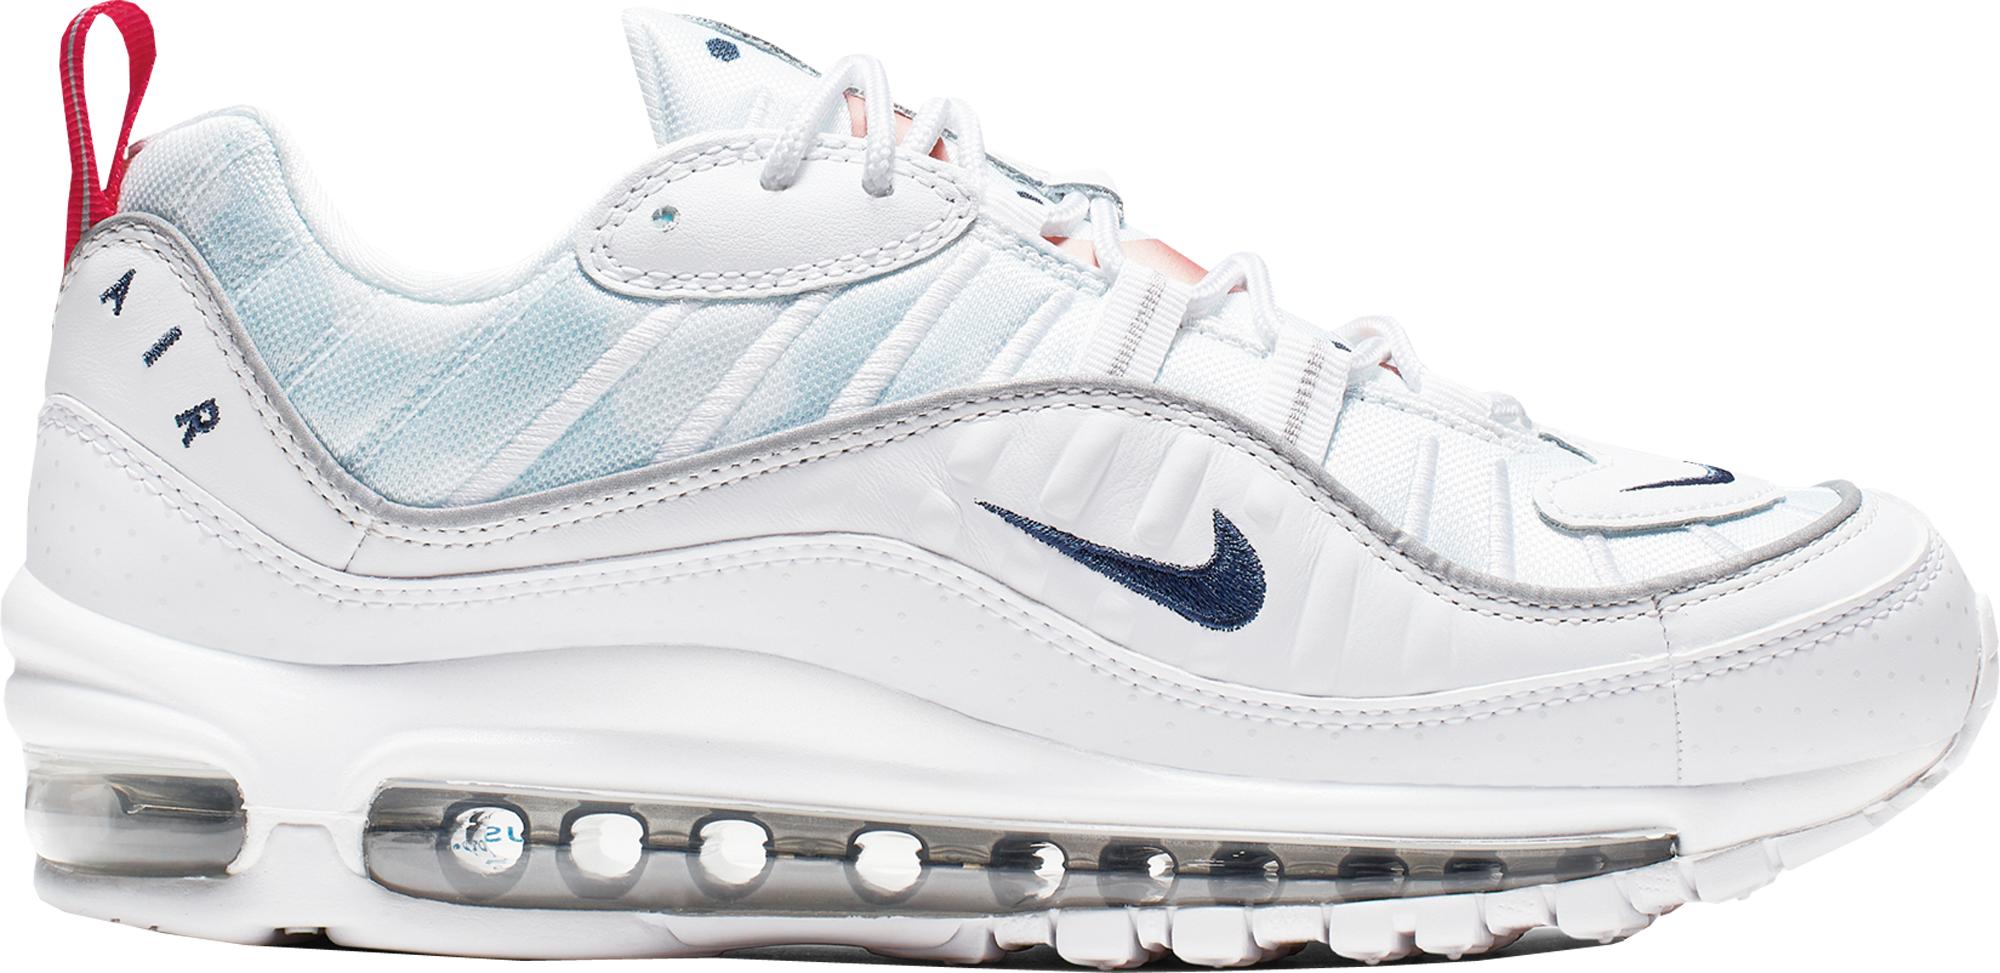 Nike Air Max 98 Unite Totale White (W